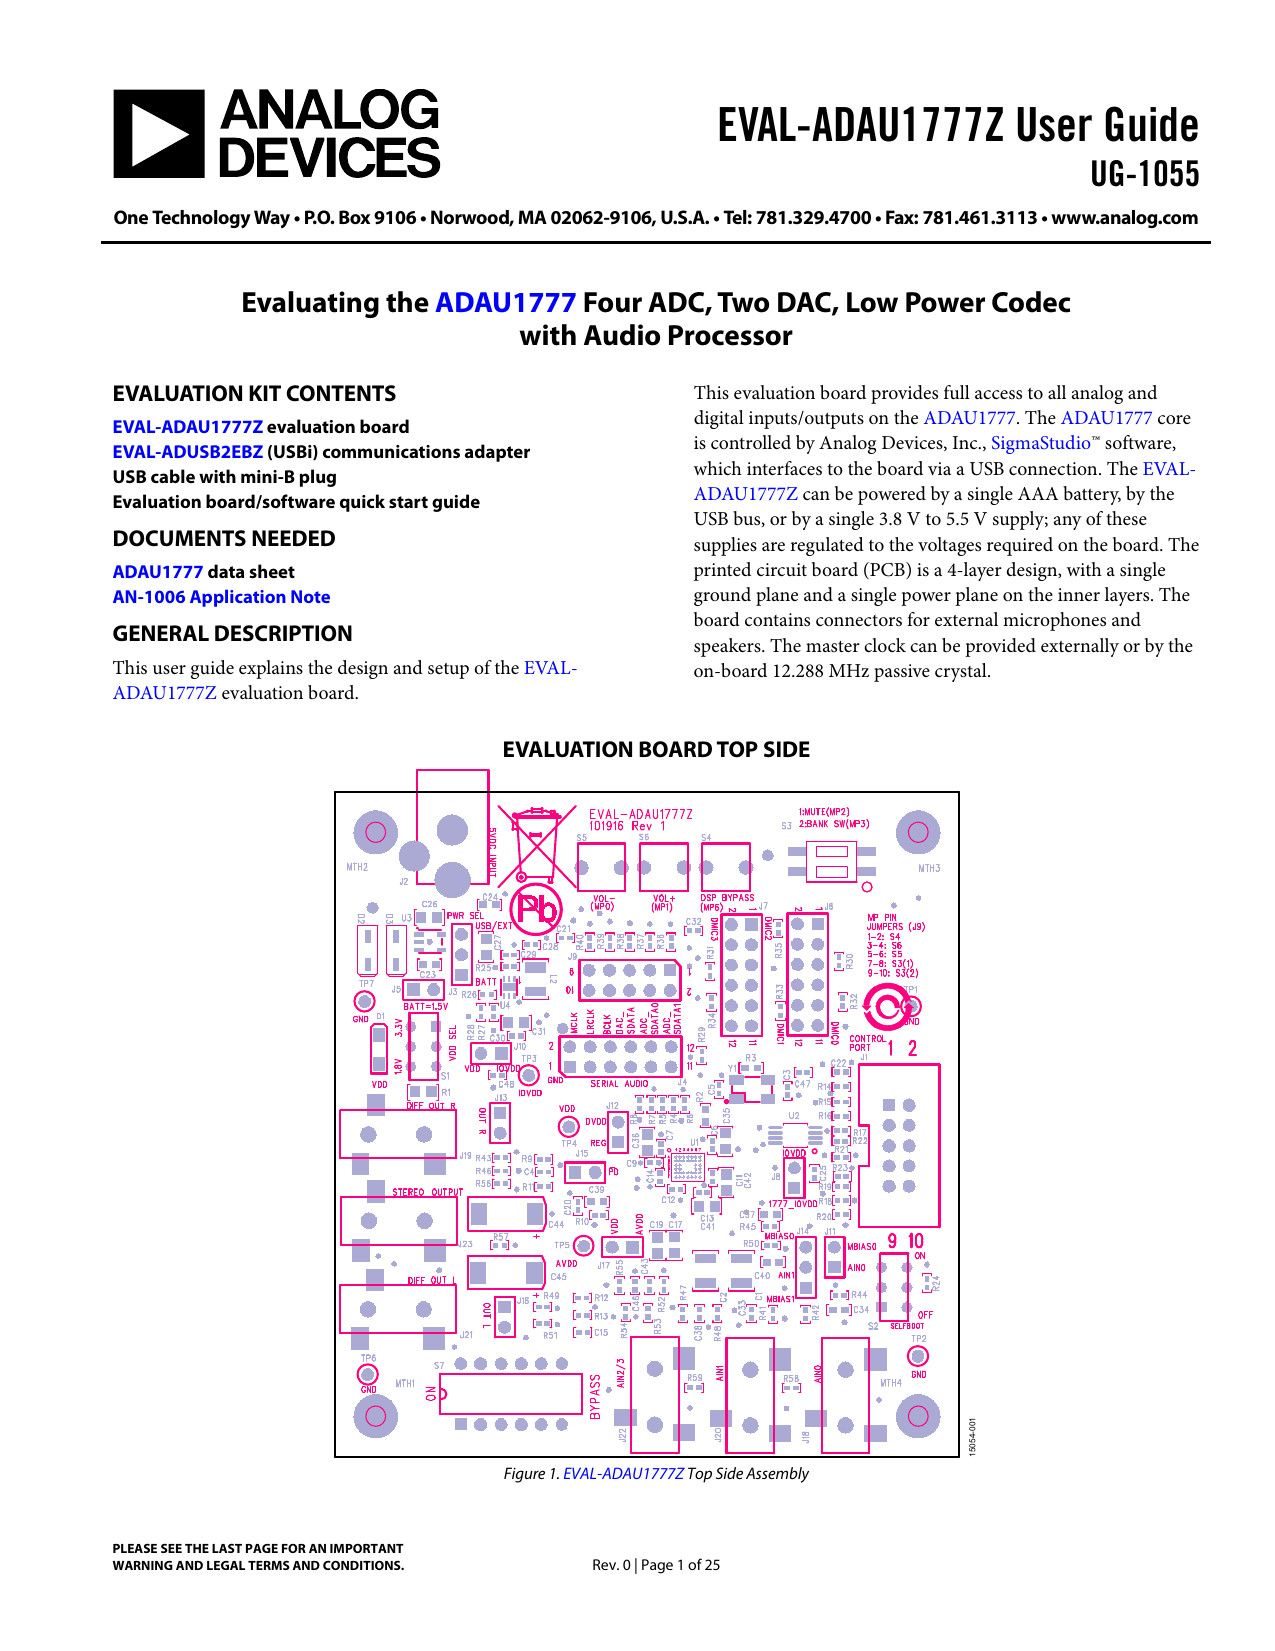 7 Blank Clock Worksheet Readingog Clocks 001 In